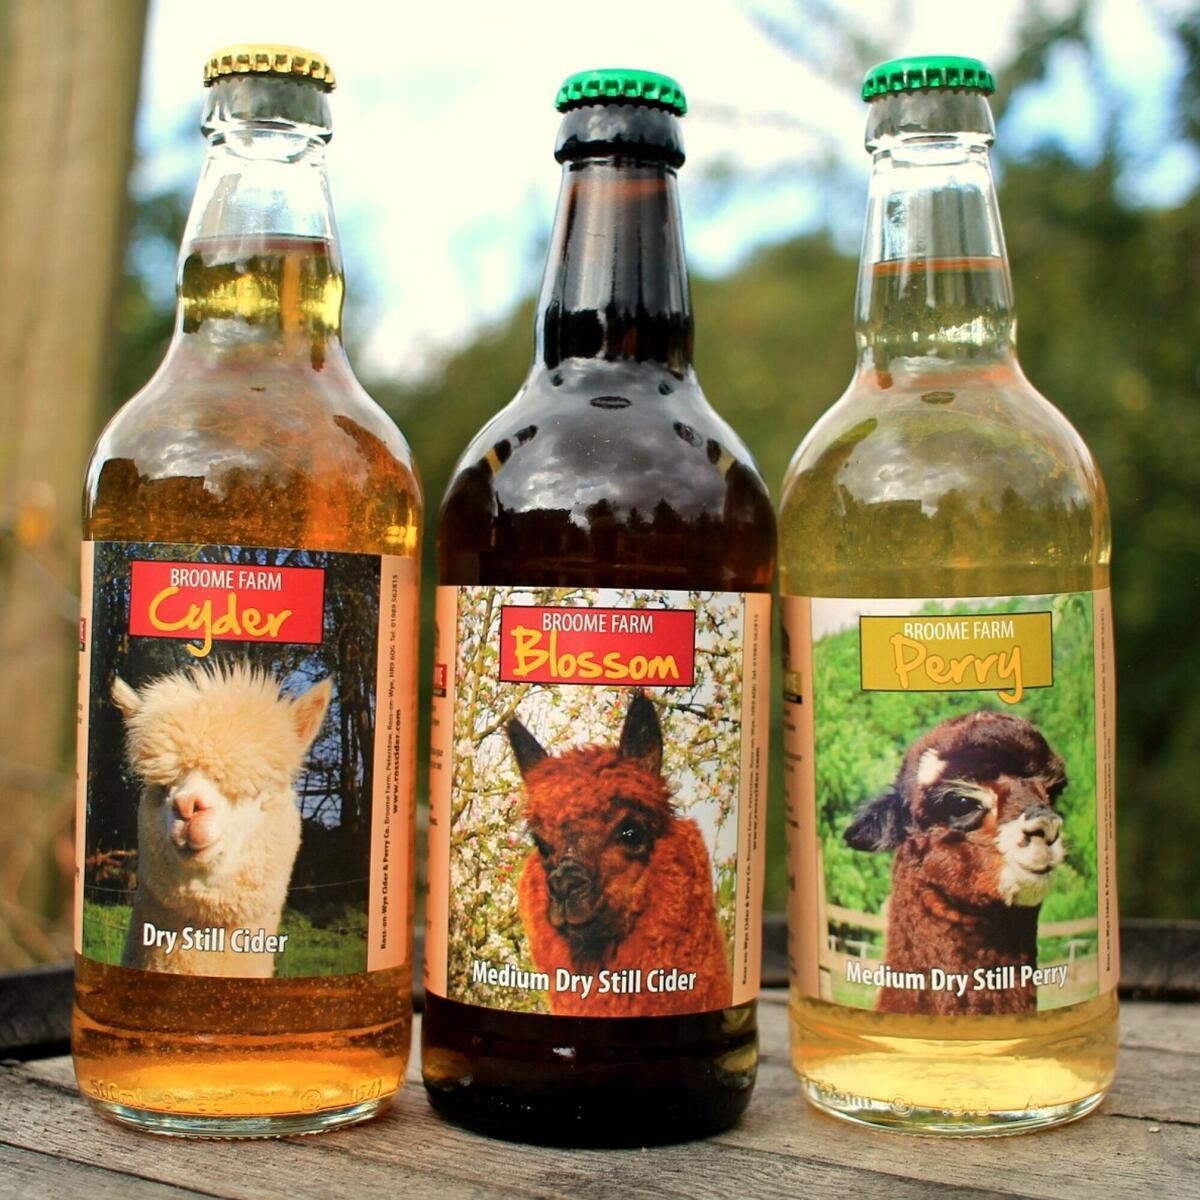 Our award winning Broome Farm cider